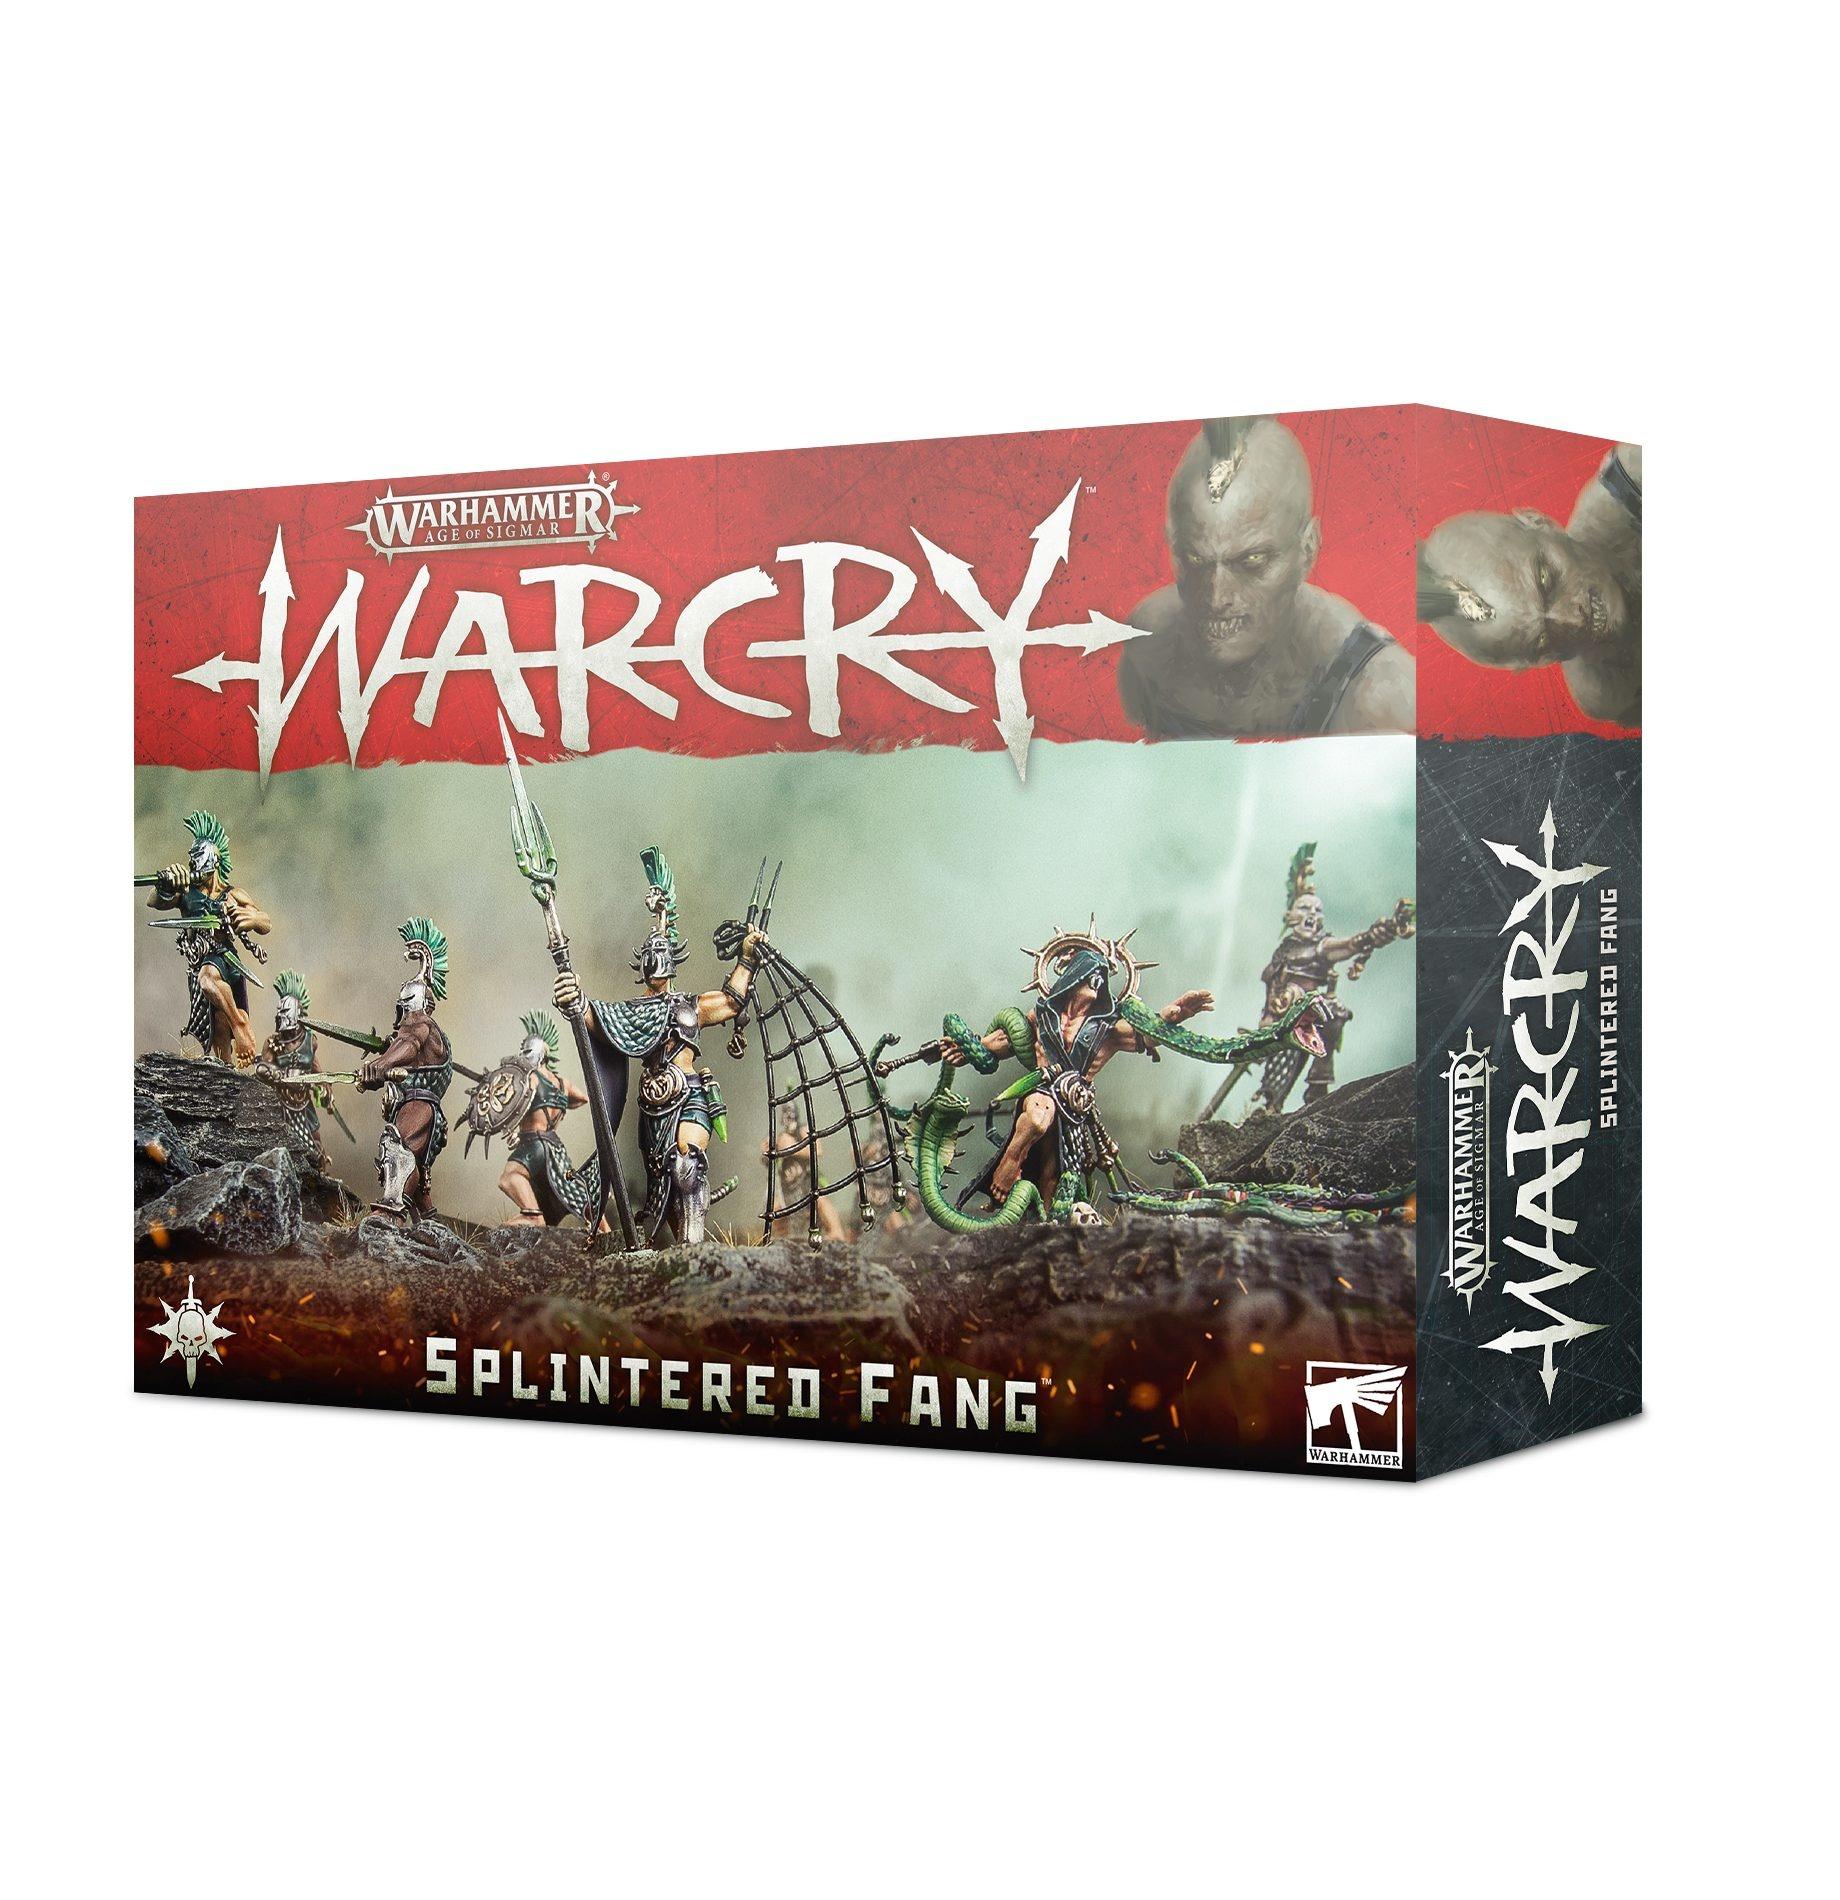 Games-Workshop Warcry: The Splintered Fang